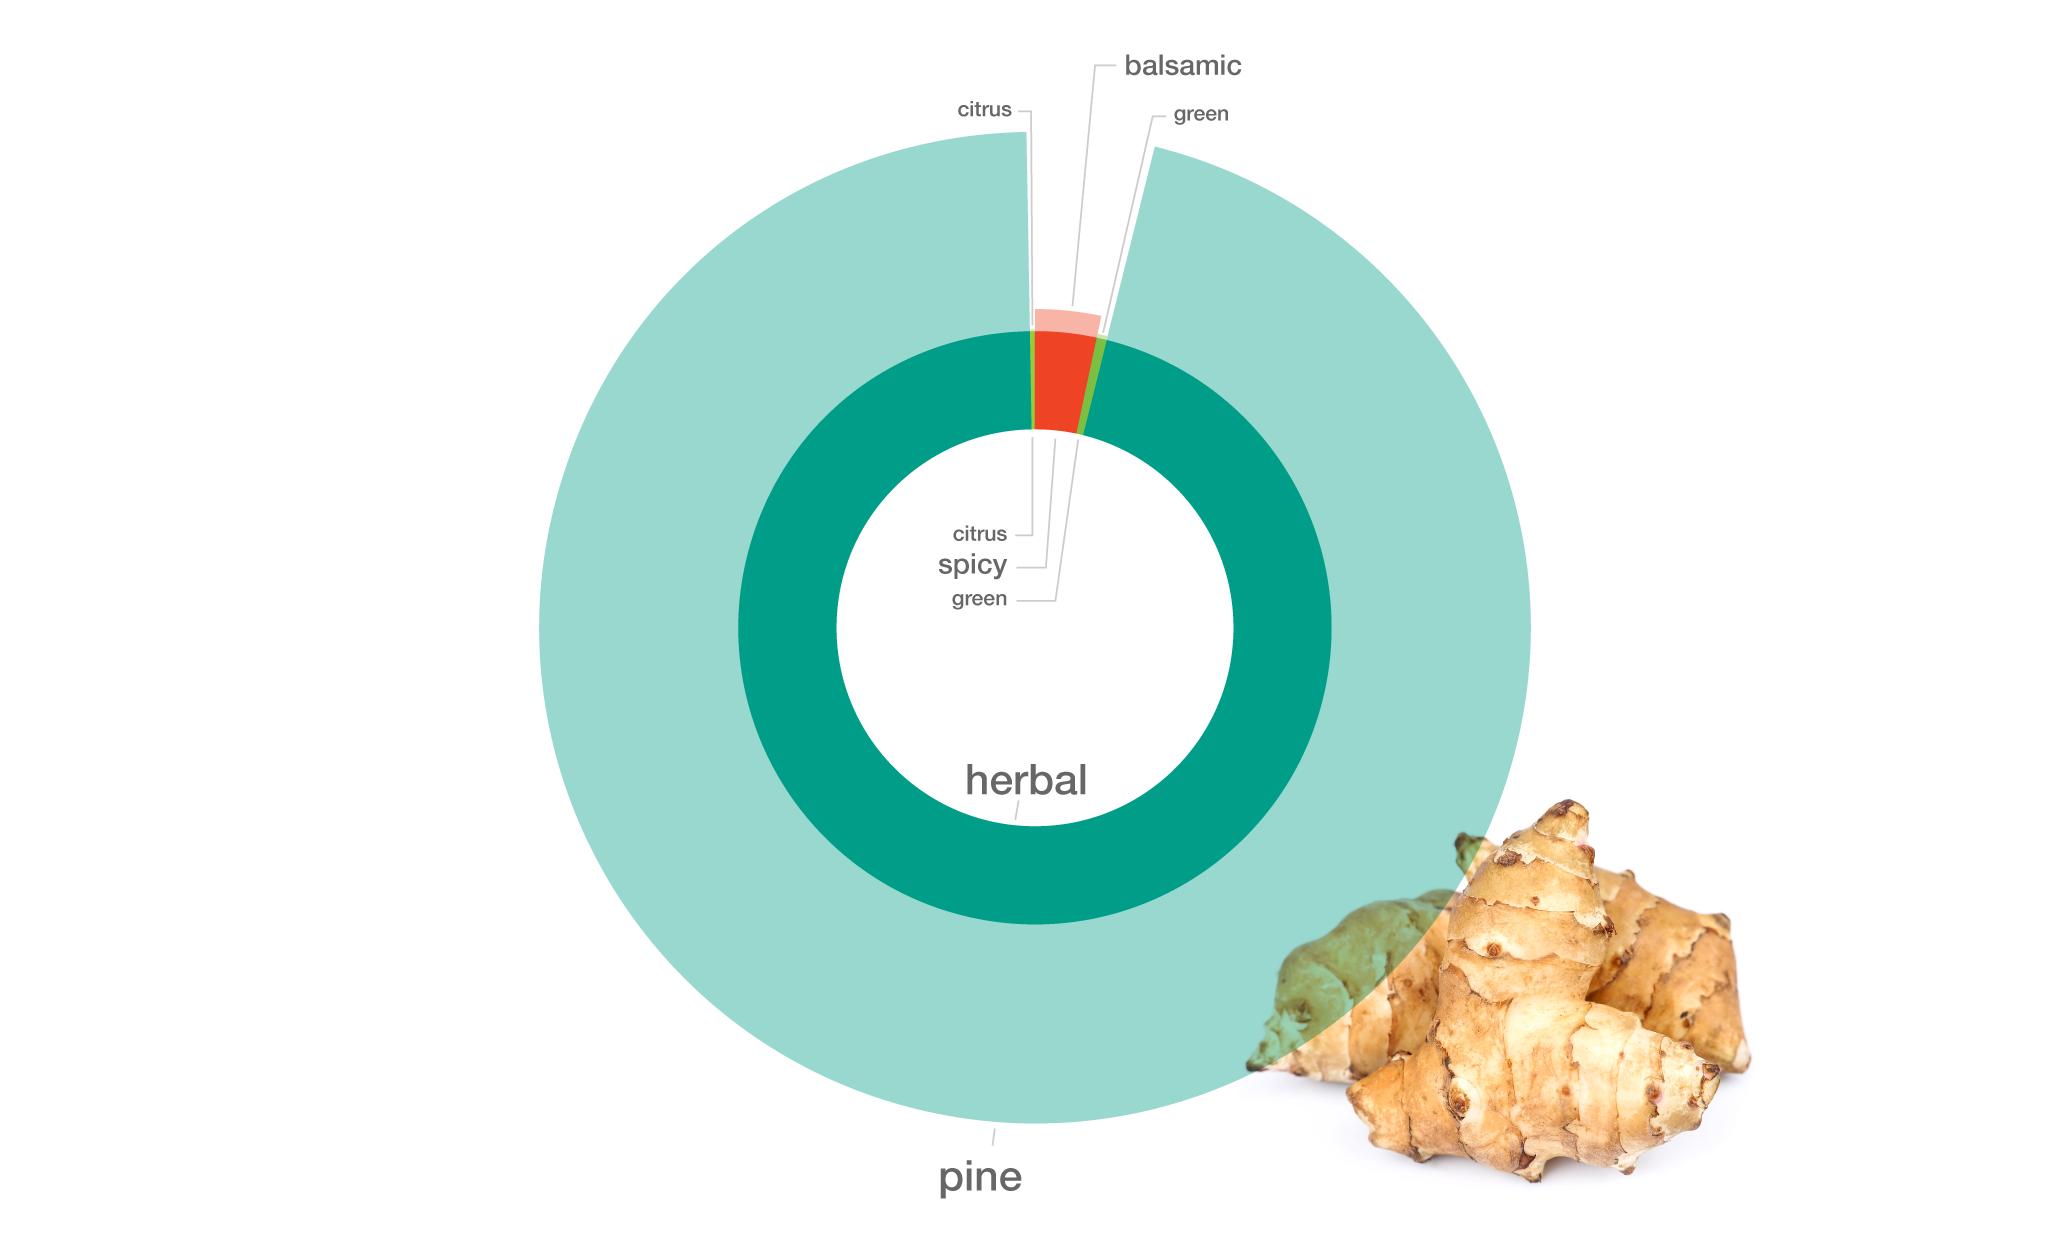 http://blog-assets.foodpairing.com/2015/12/FP-Cooked-Jerusalem-Artichoke-Aroma-Wheel.png